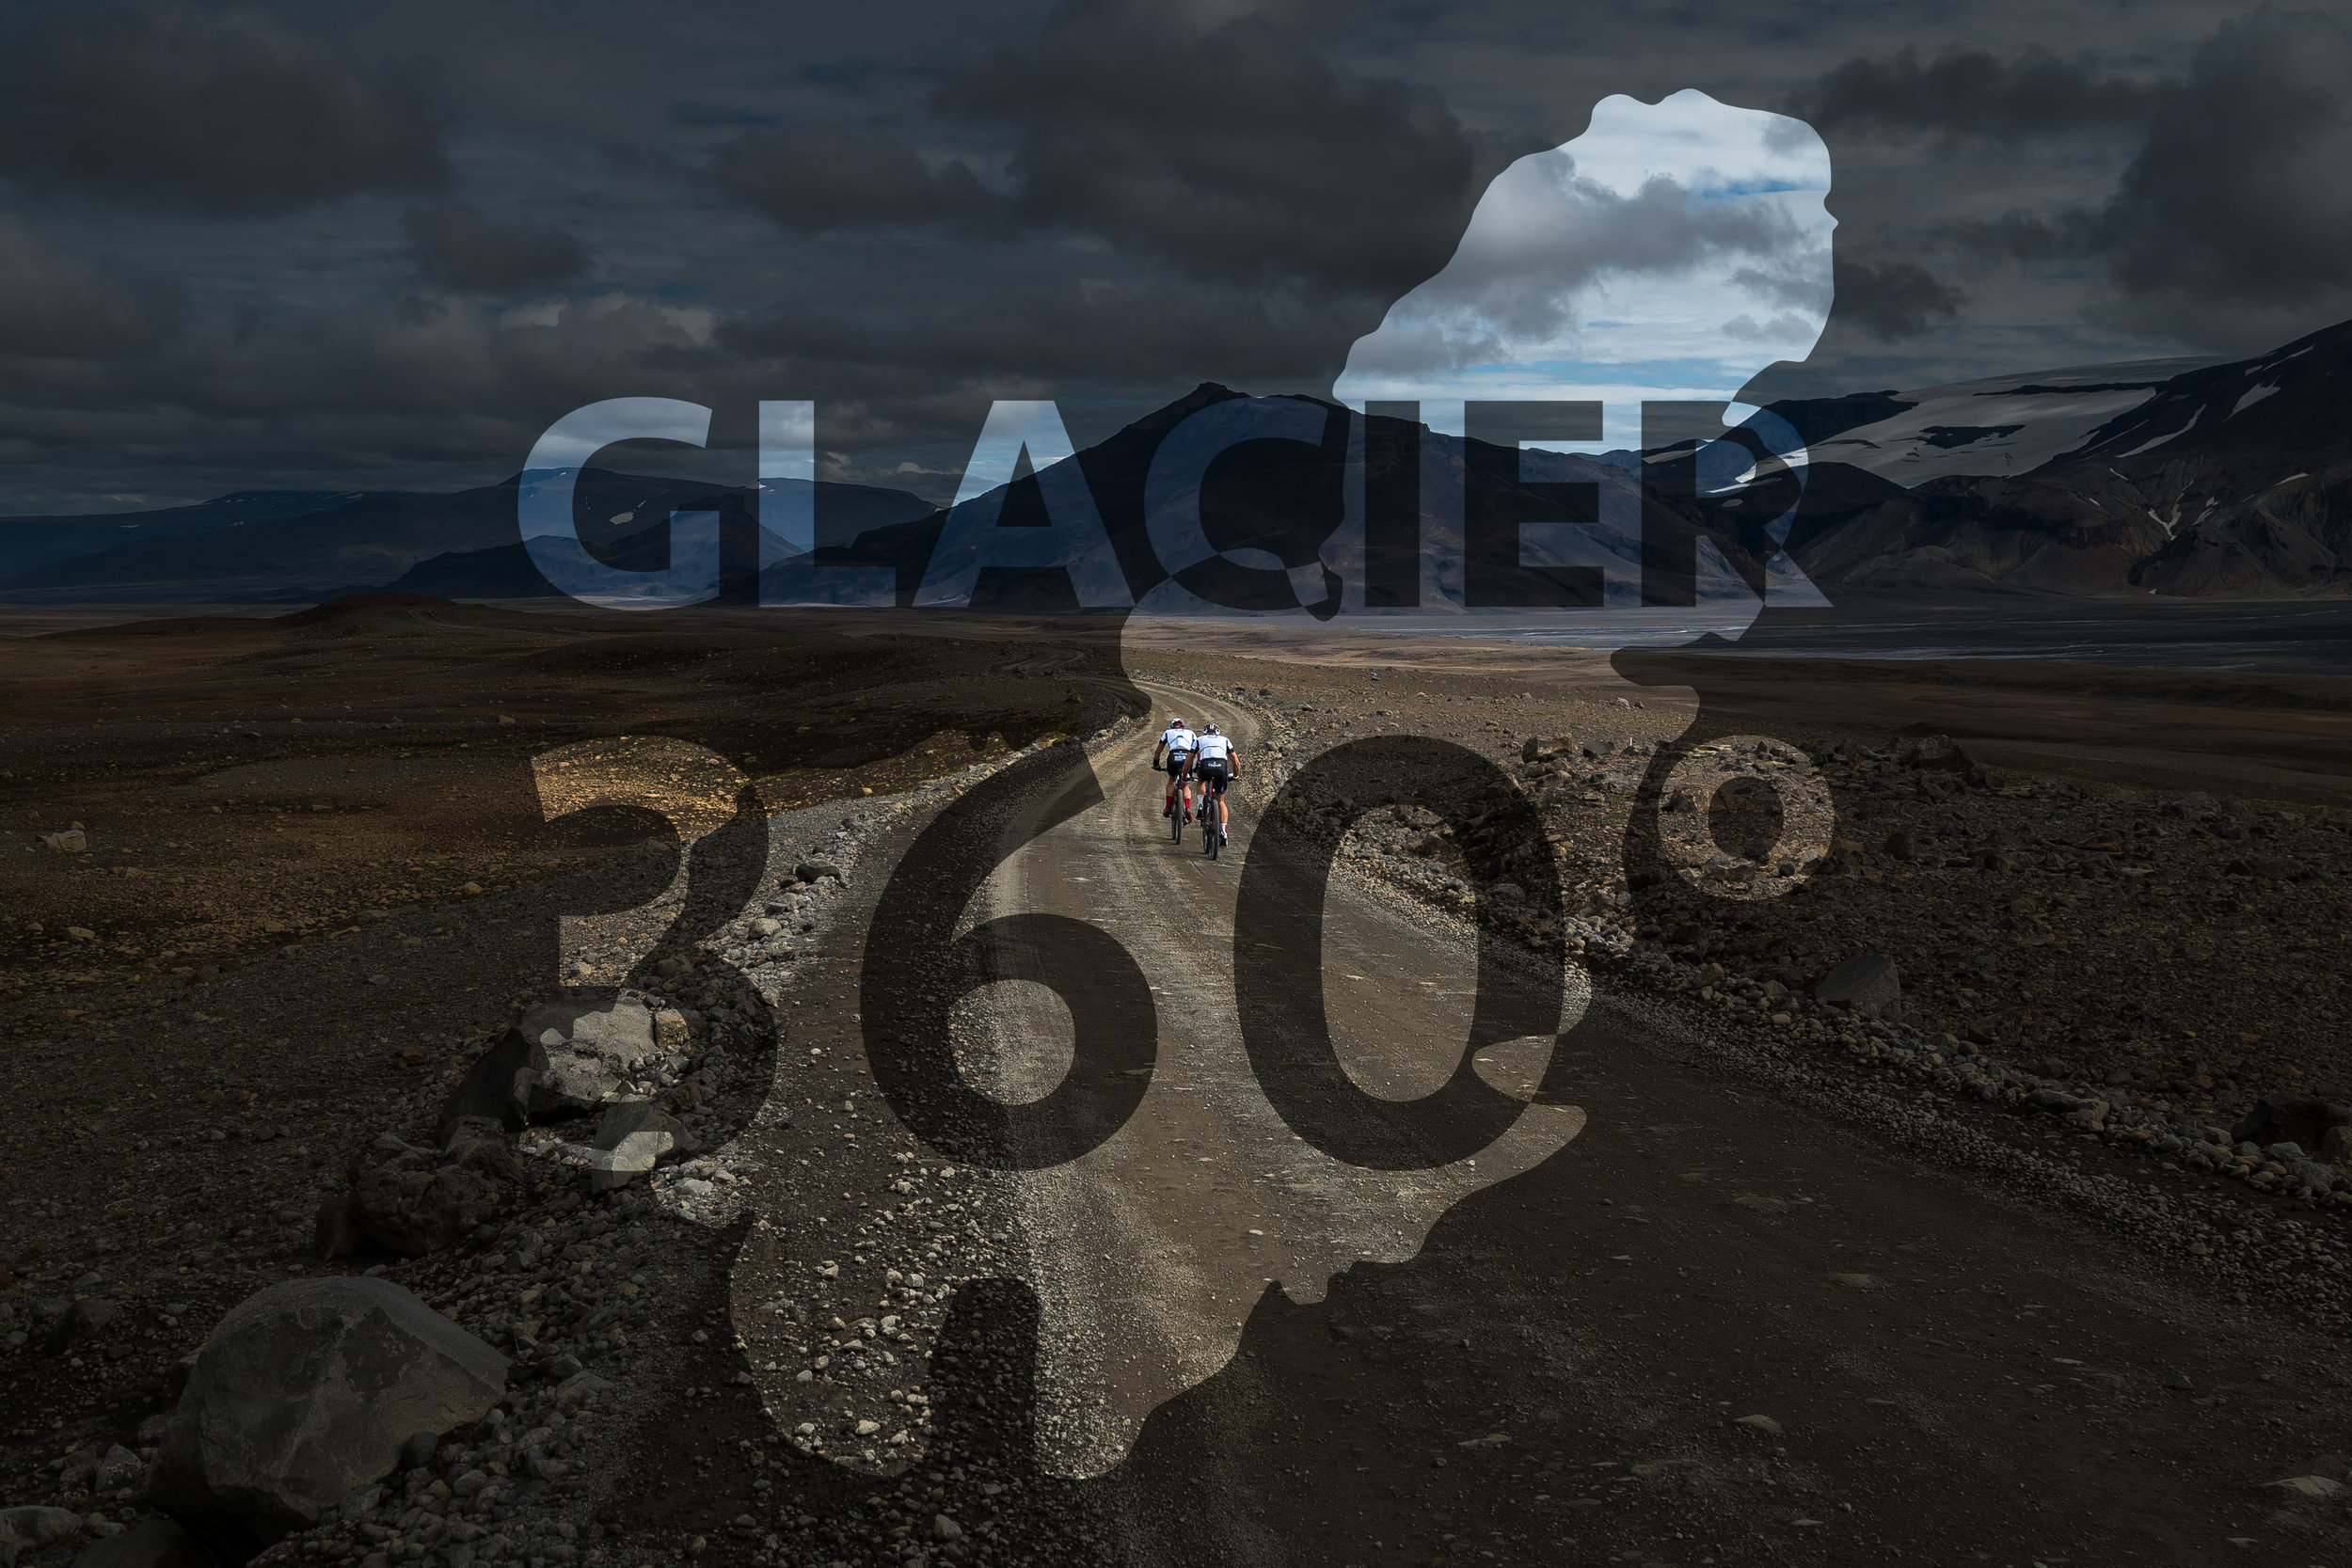 Glacier 360 logo overlay Snorri Þór Tryggvason-DSC00645.jpg